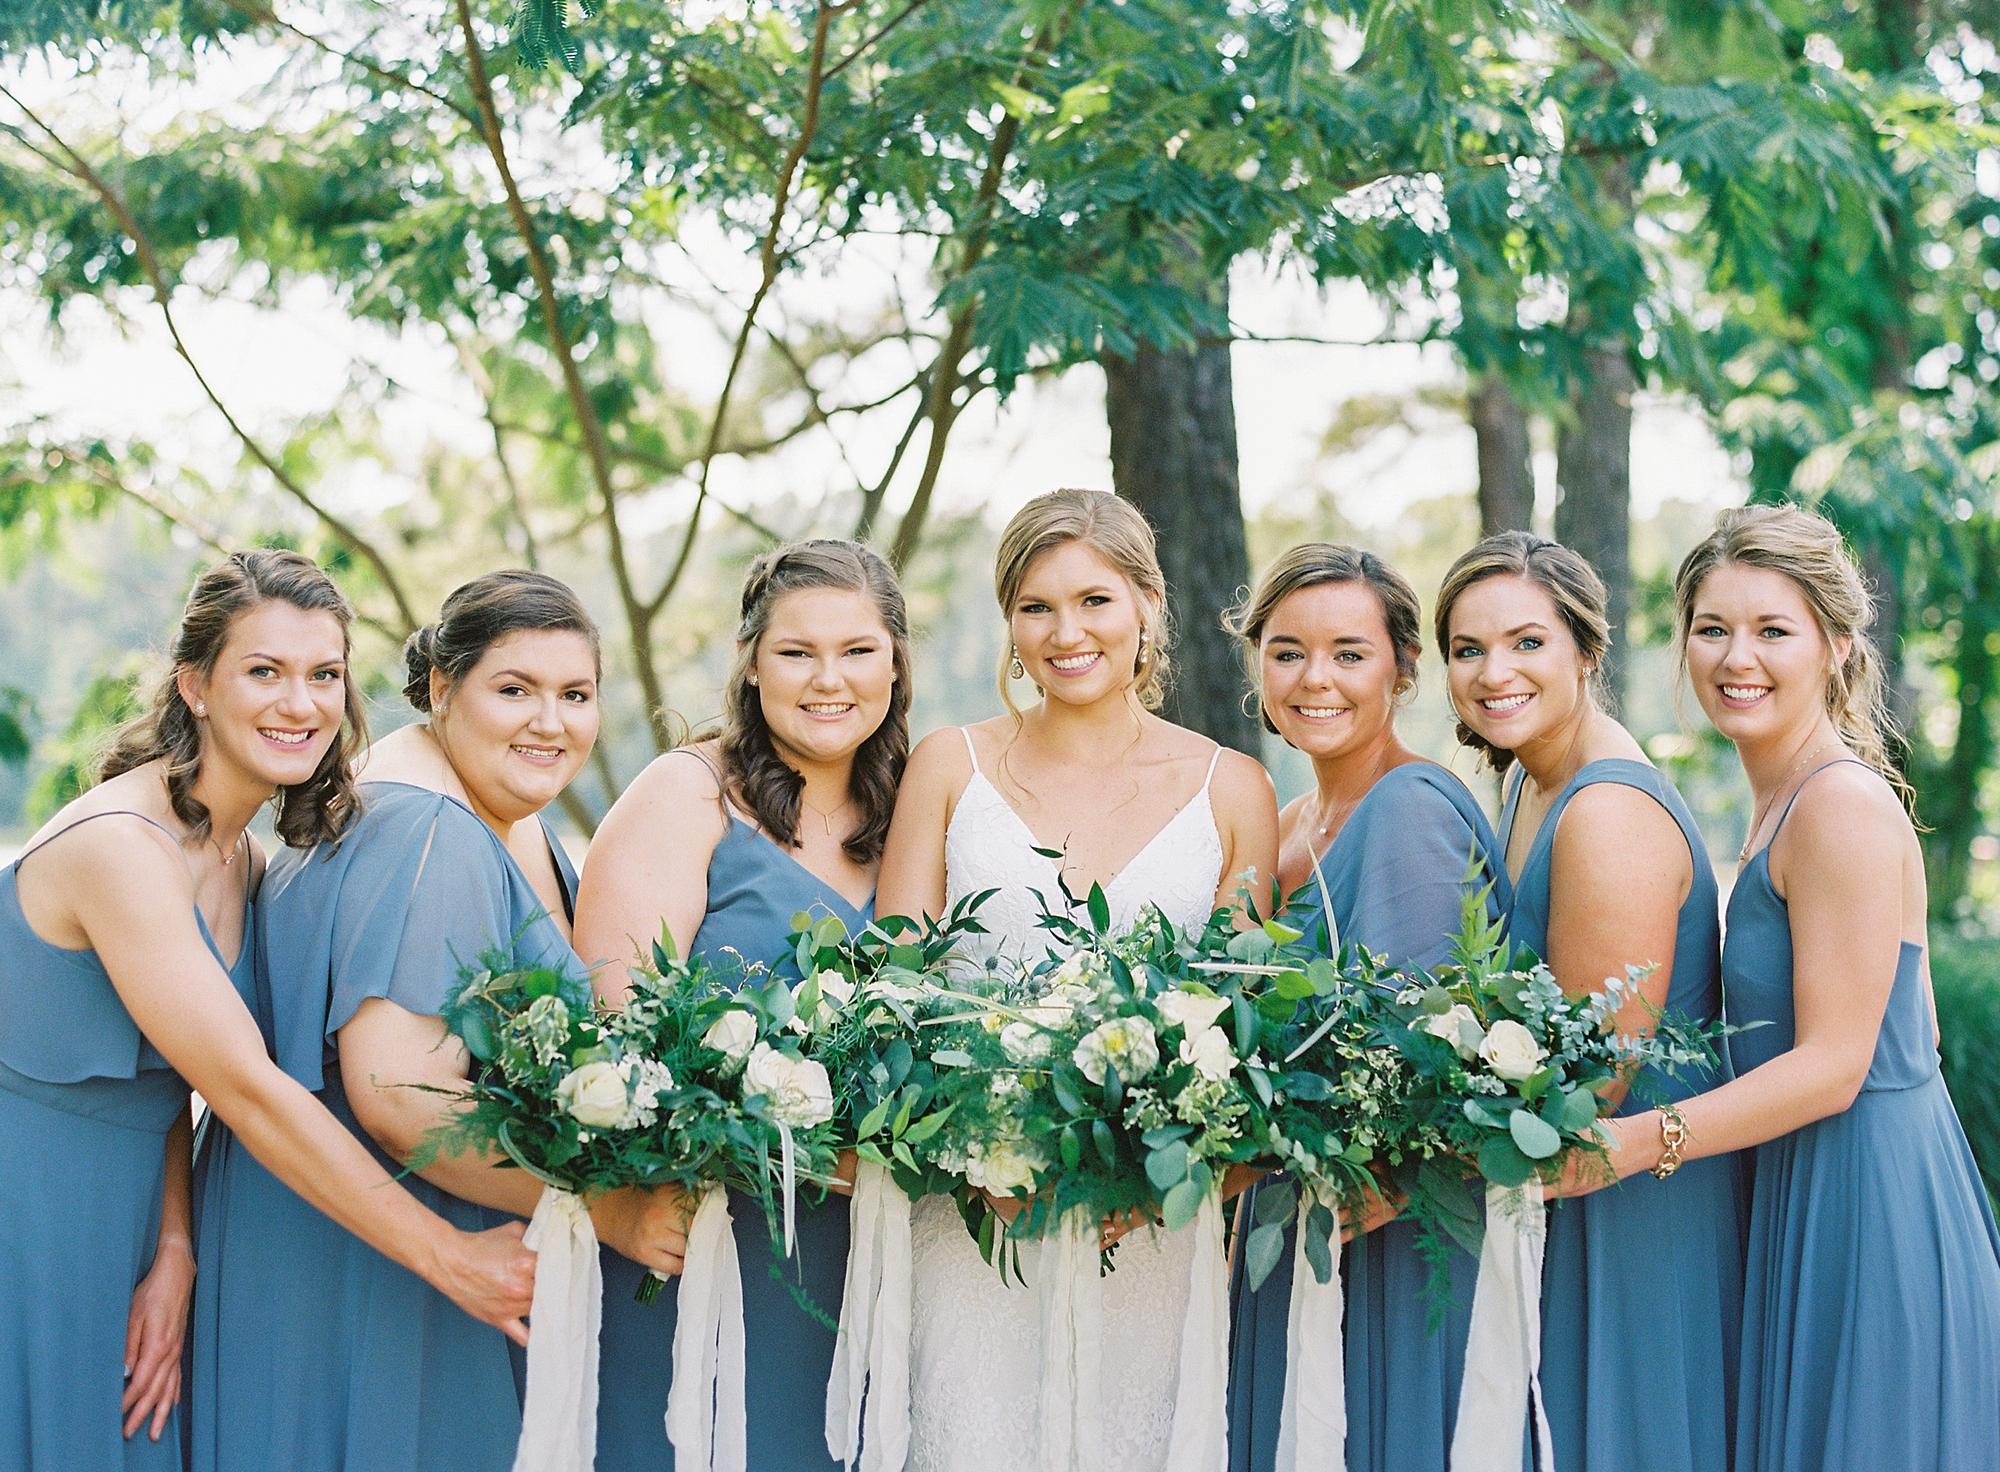 Angus-Barn-Pavilion-Raleigh-Wedding-Film-Photographer_0209.jpg